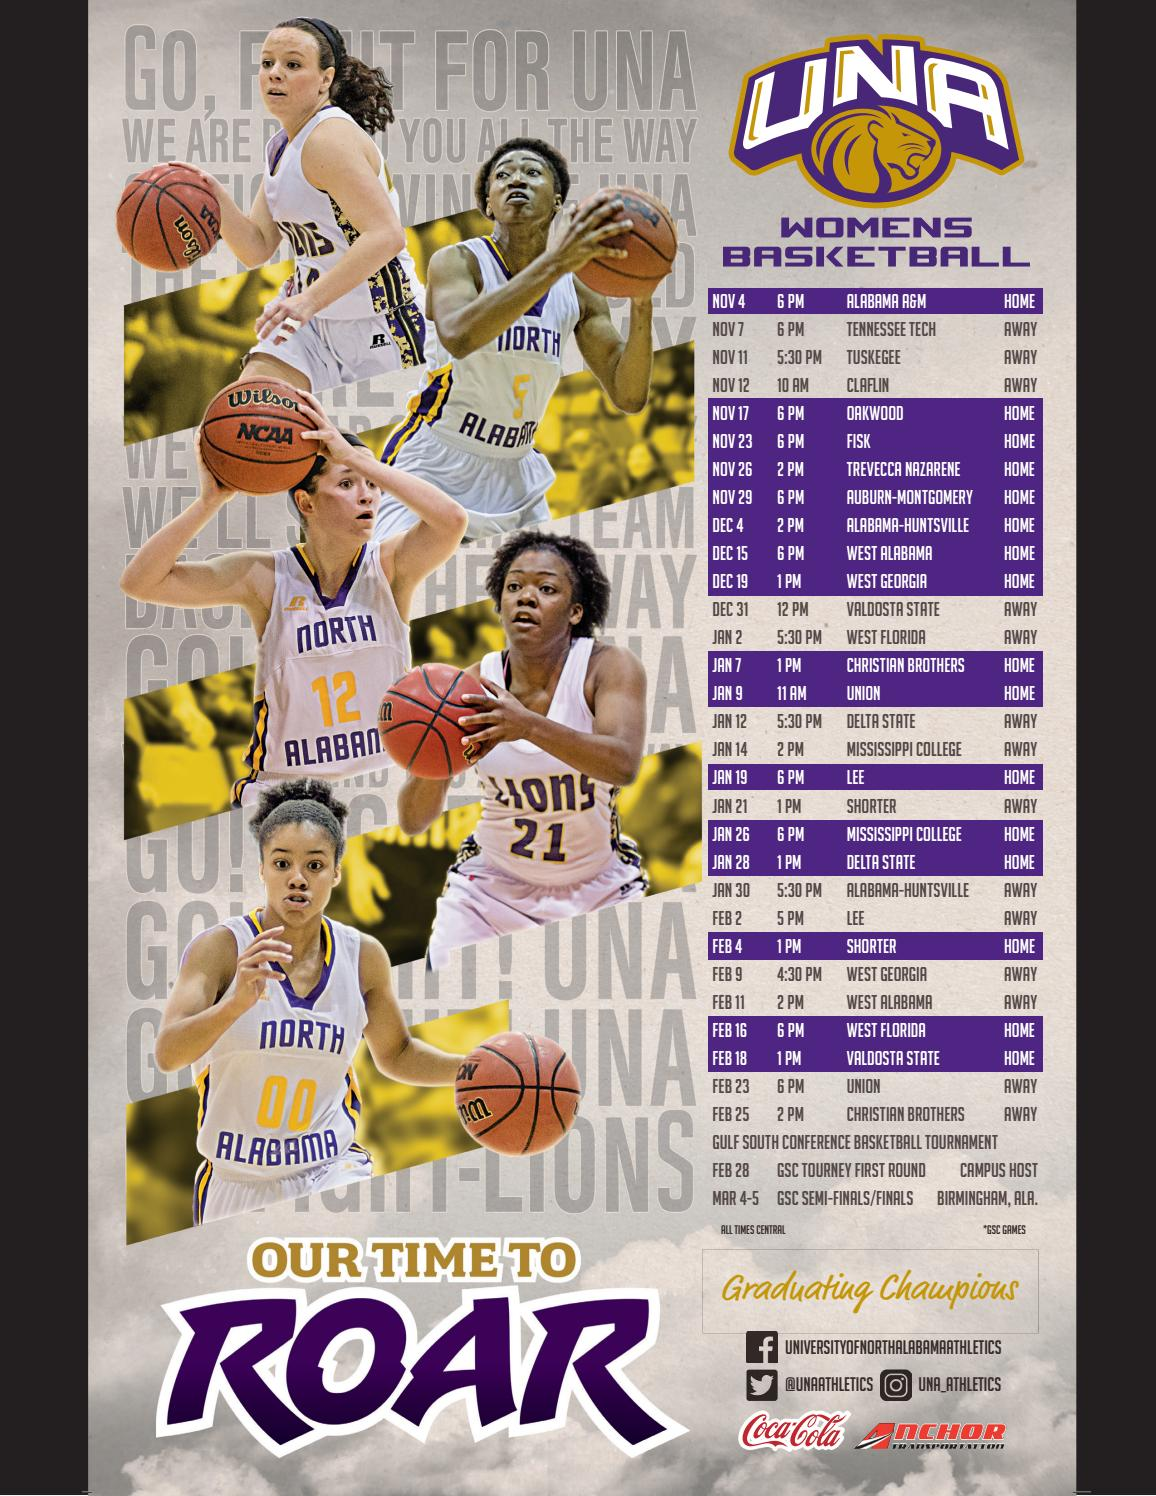 2016-17 UNA Women's Basketball Media Guide by University ...